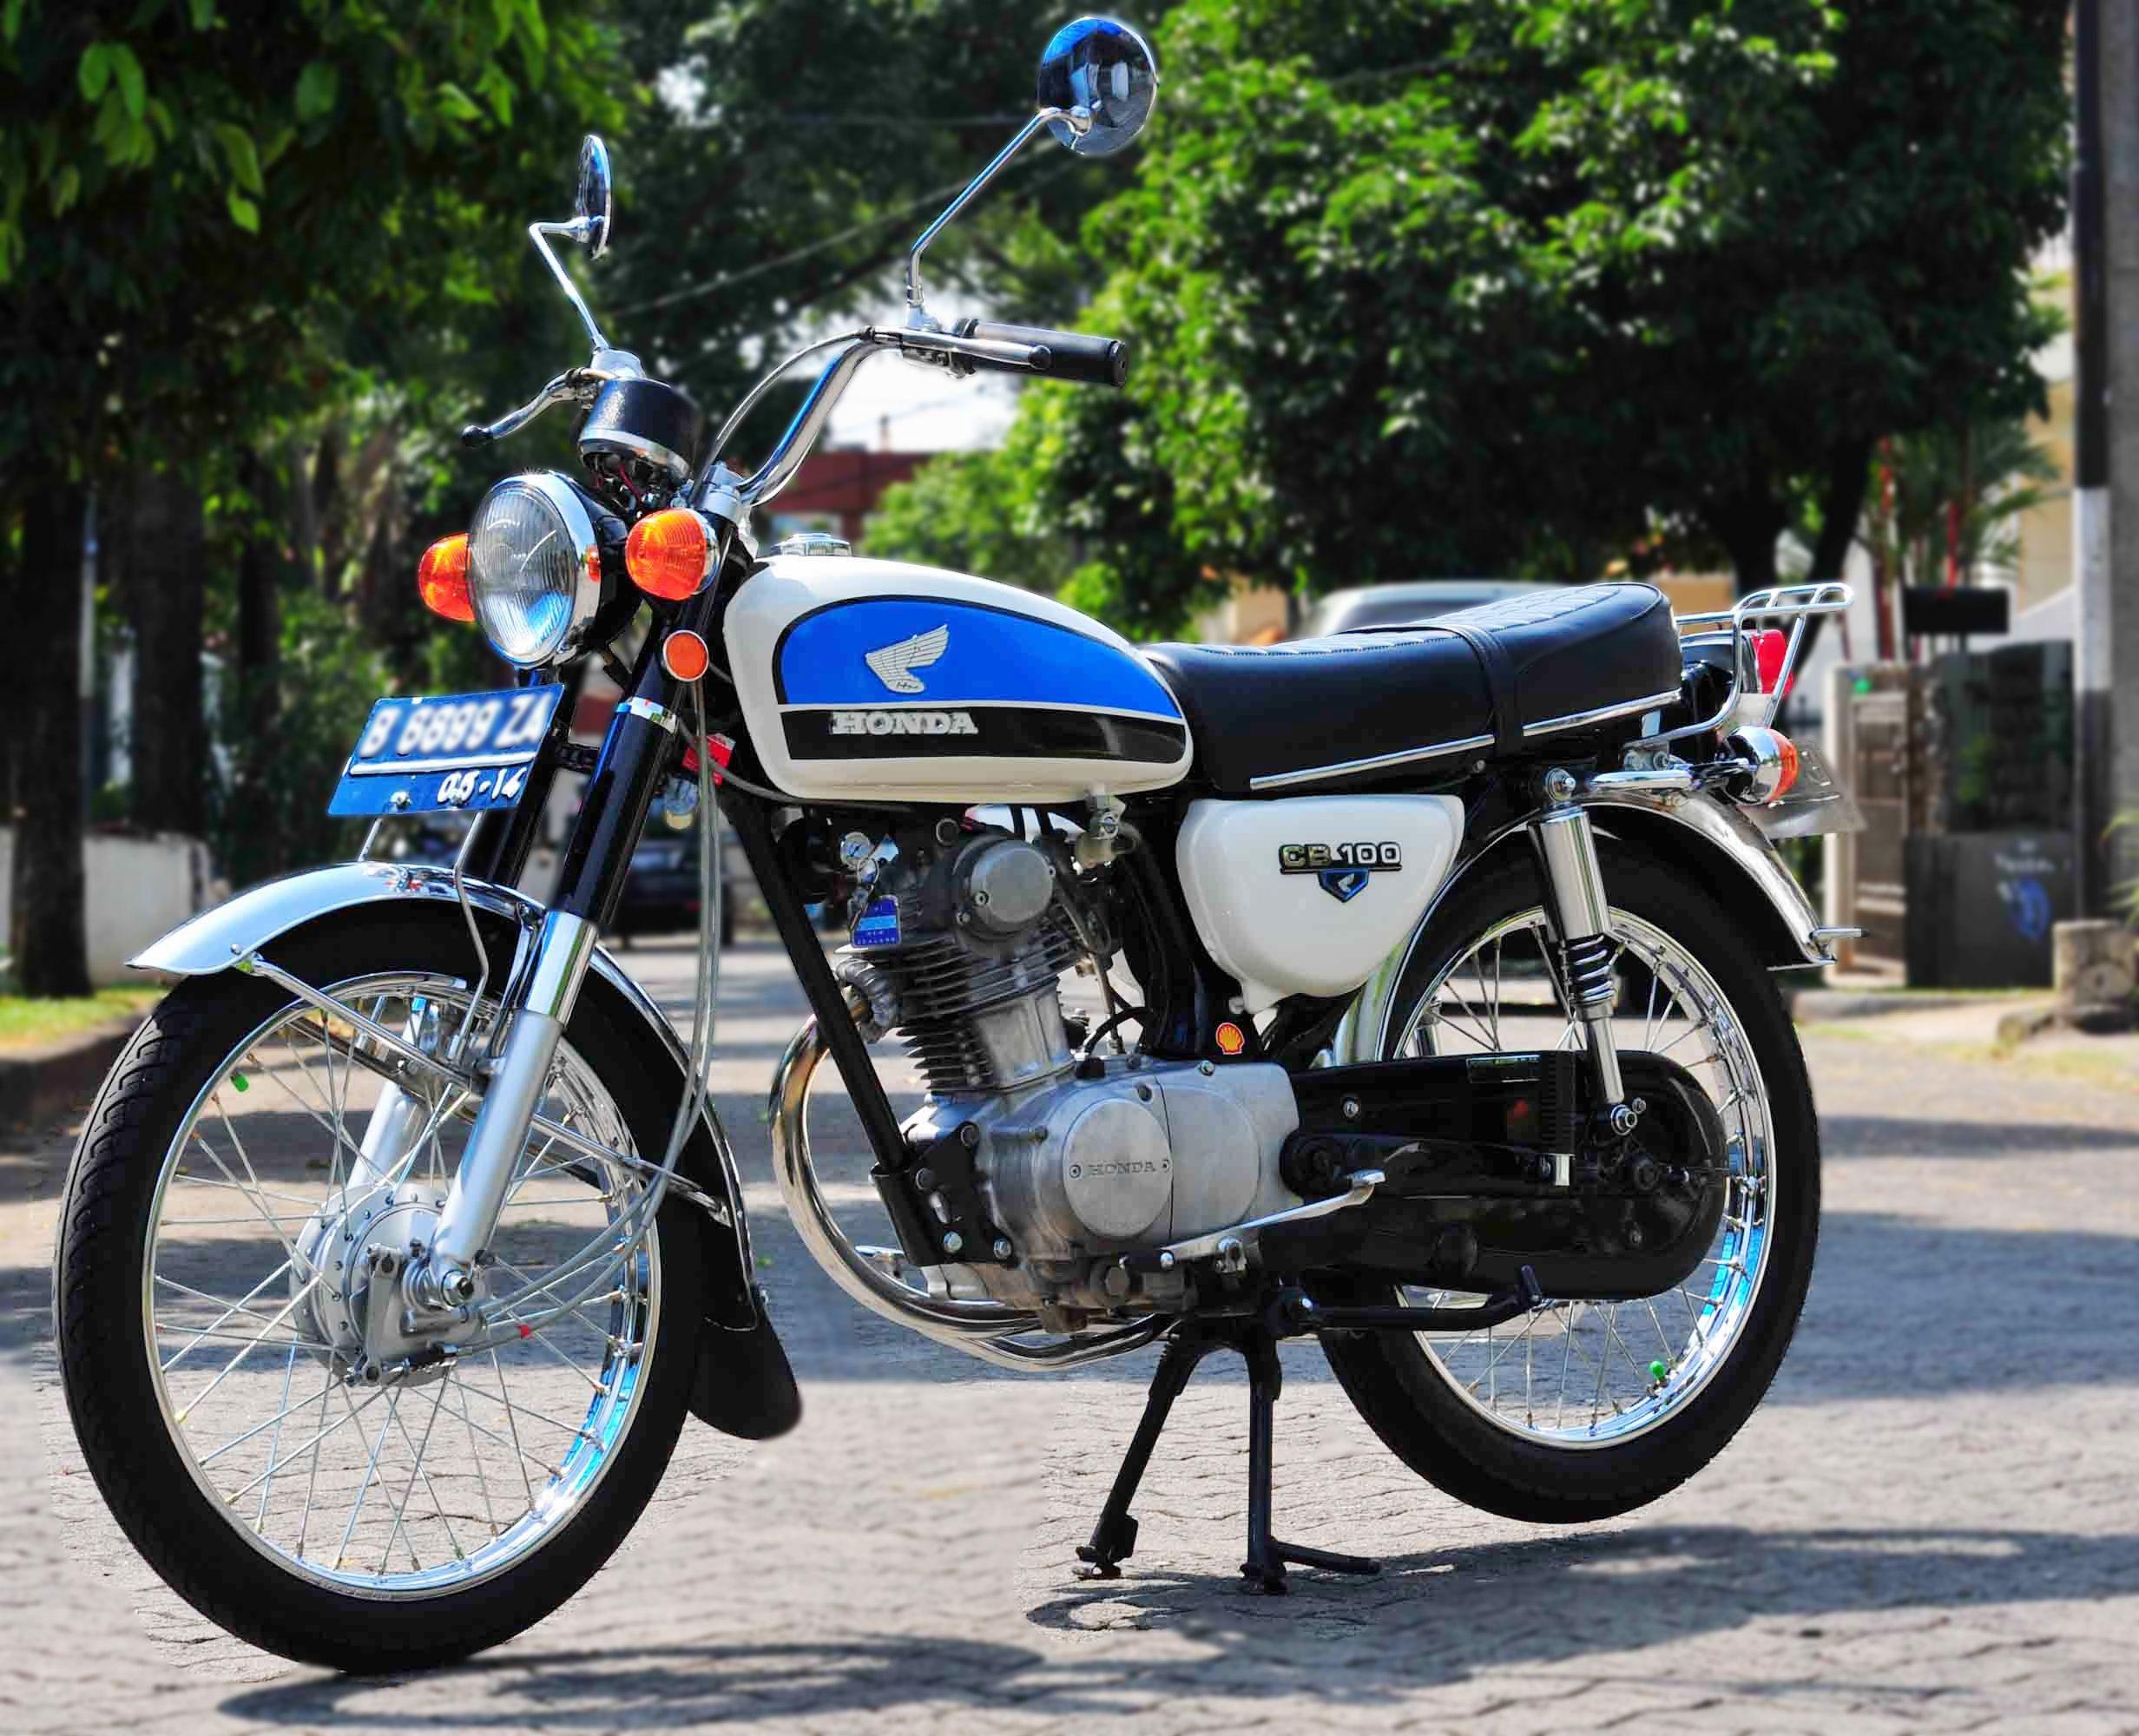 Modifikasi Motor Honda cb 100 Honda cb 100, Vintage